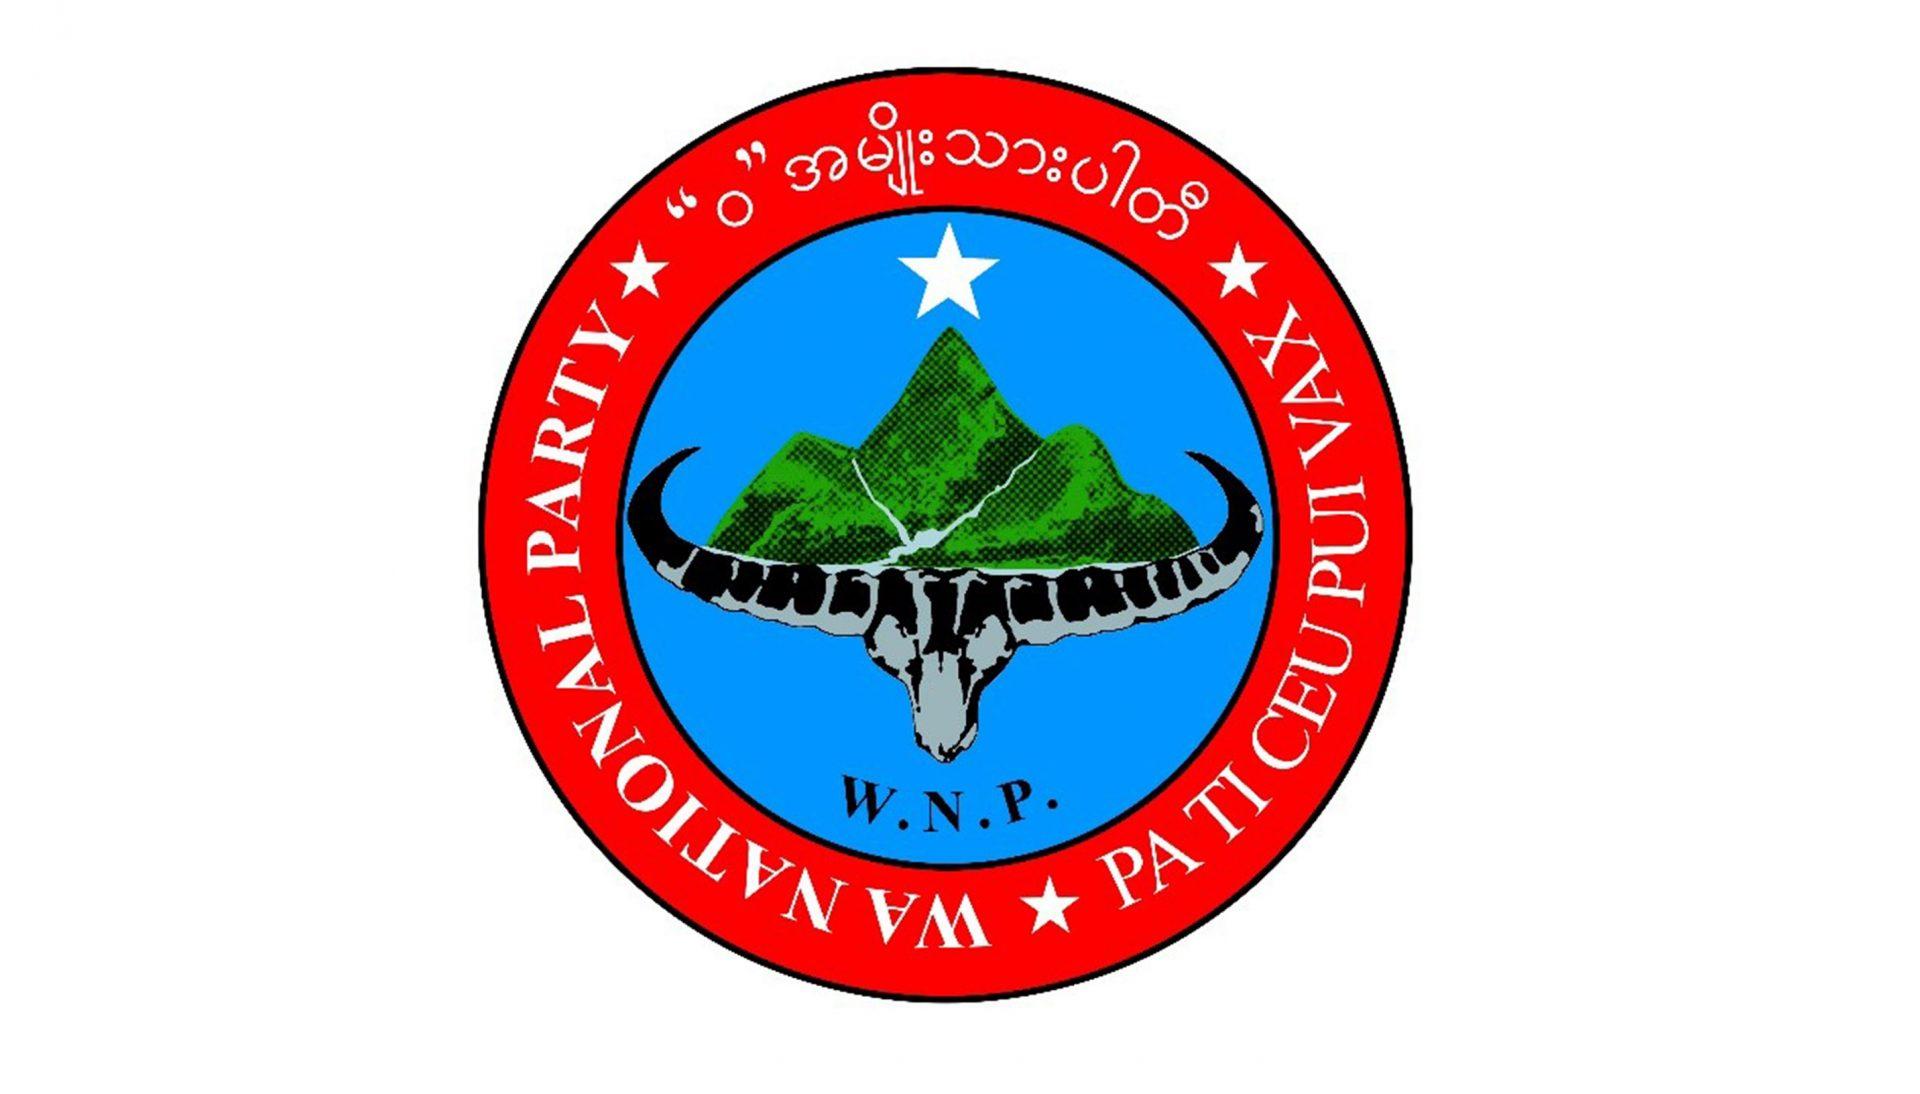 Wa National Party Logo scaled